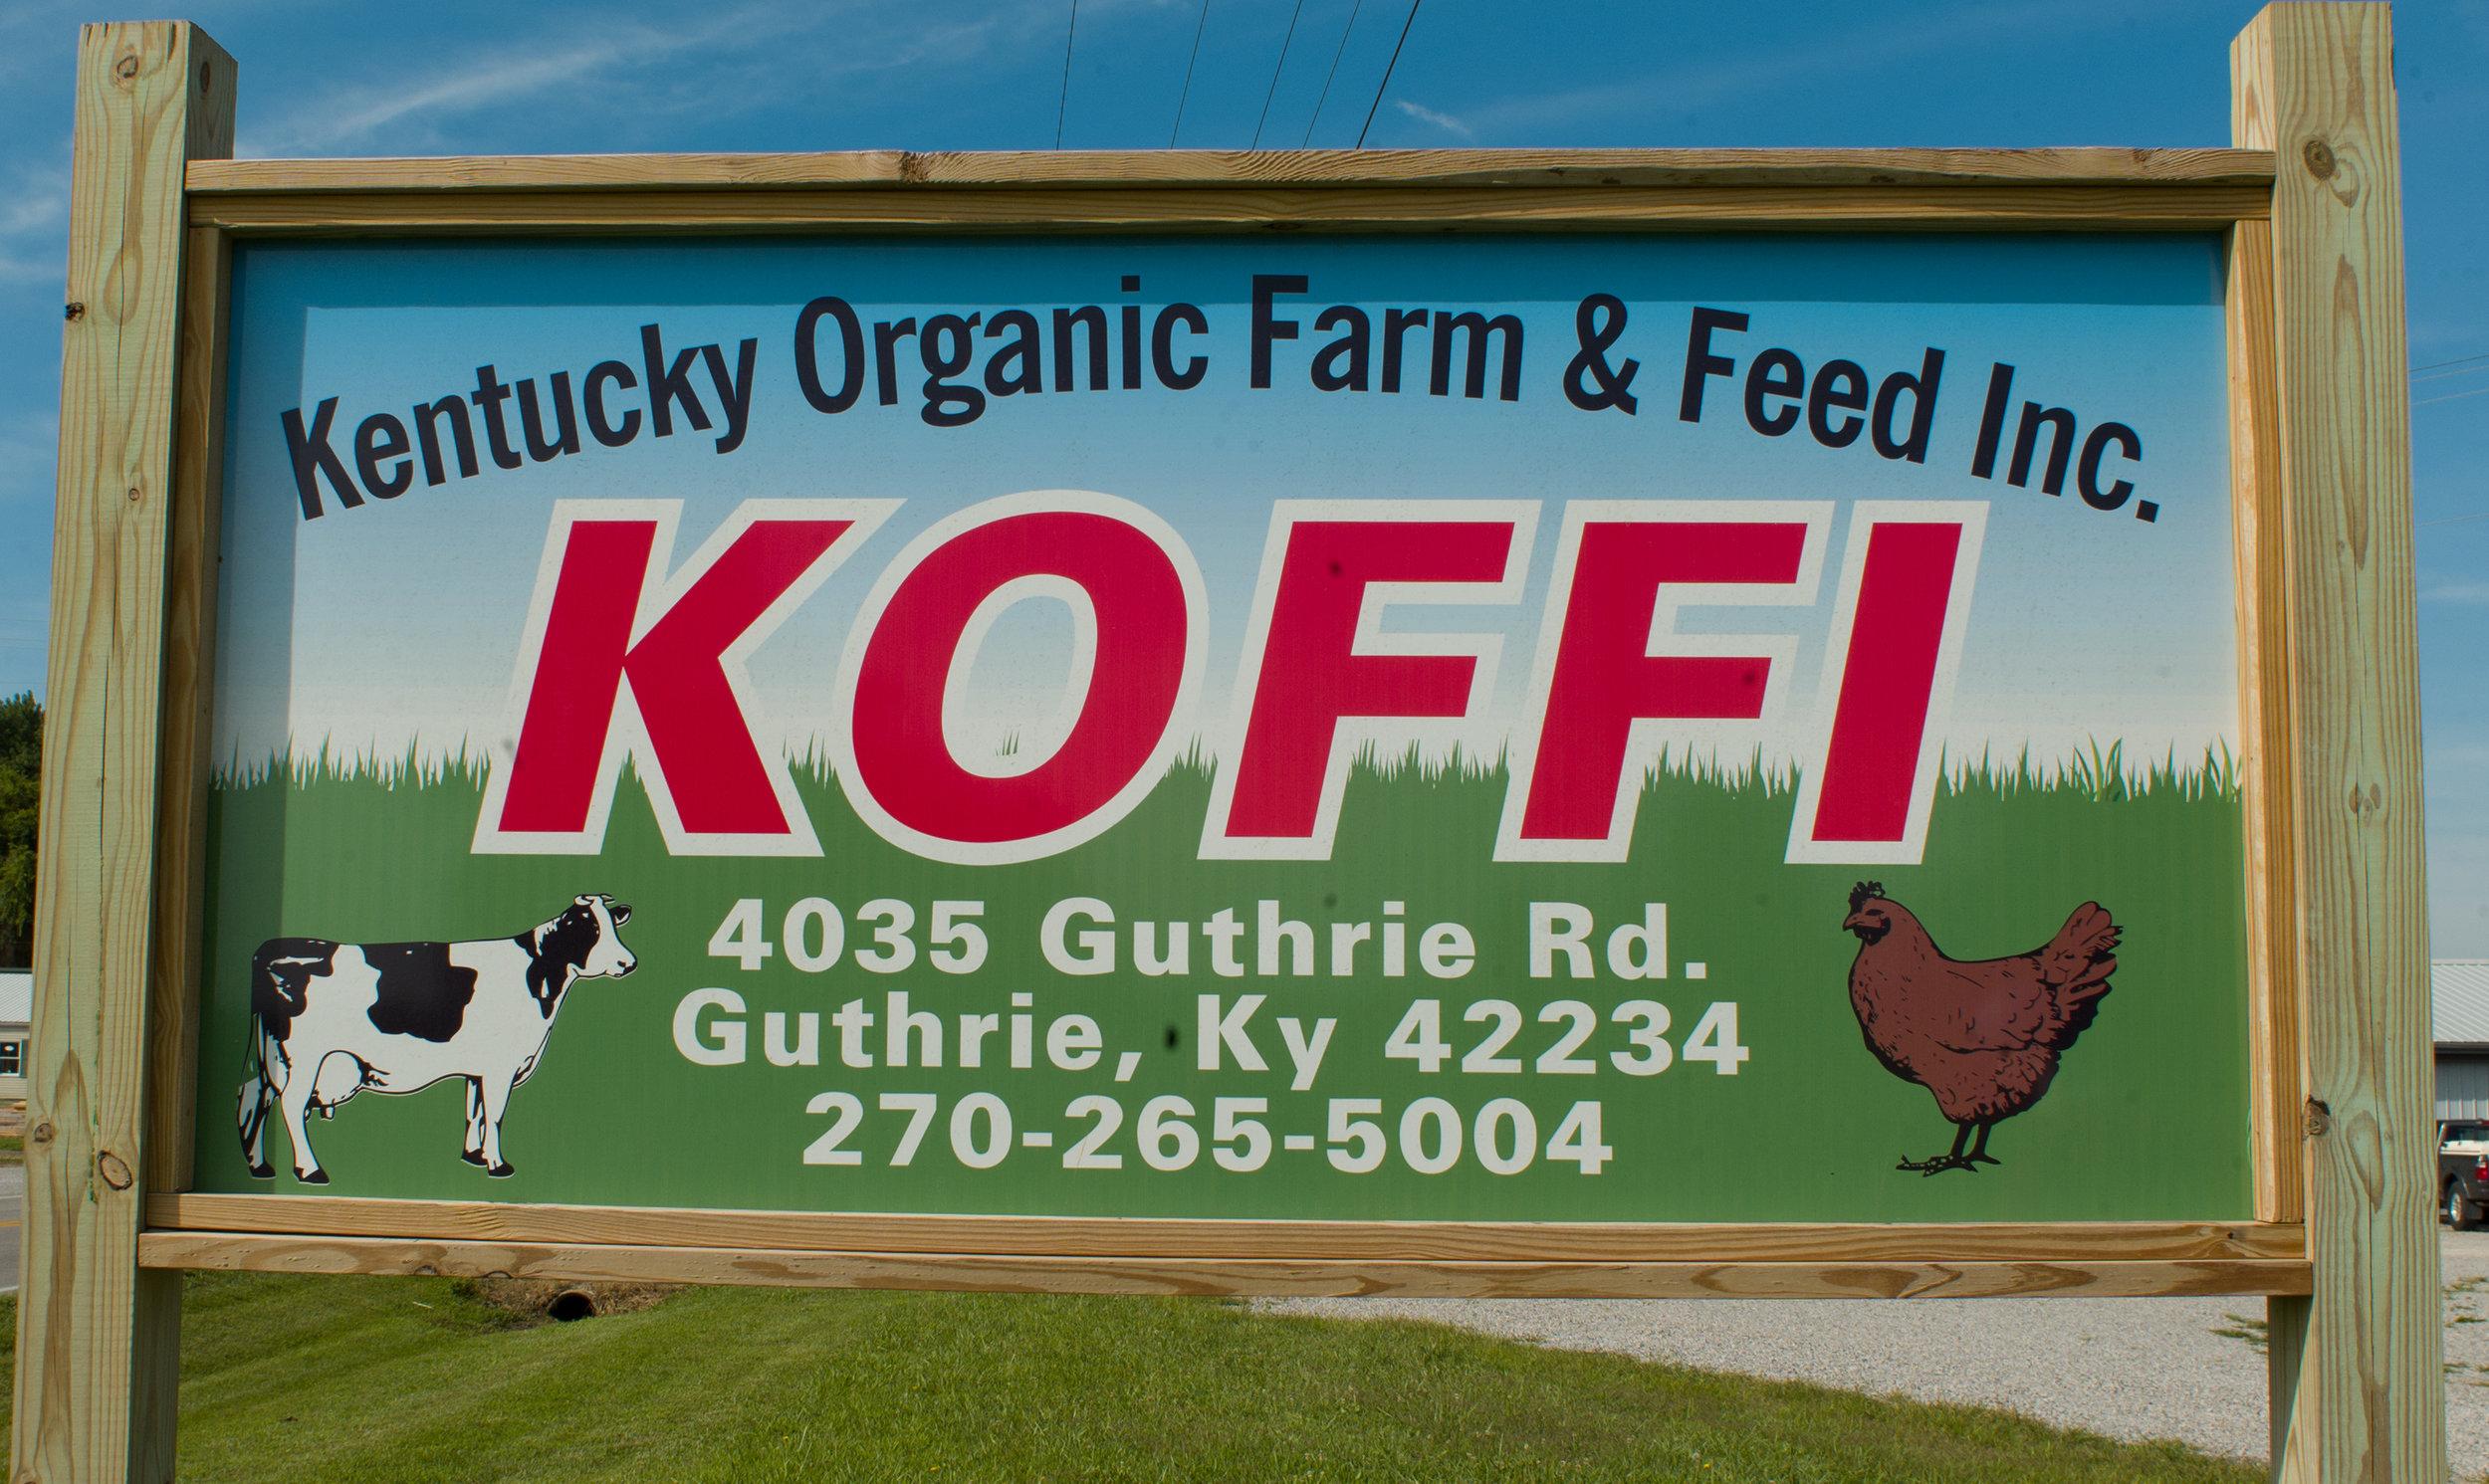 KOFFI sign.jpg